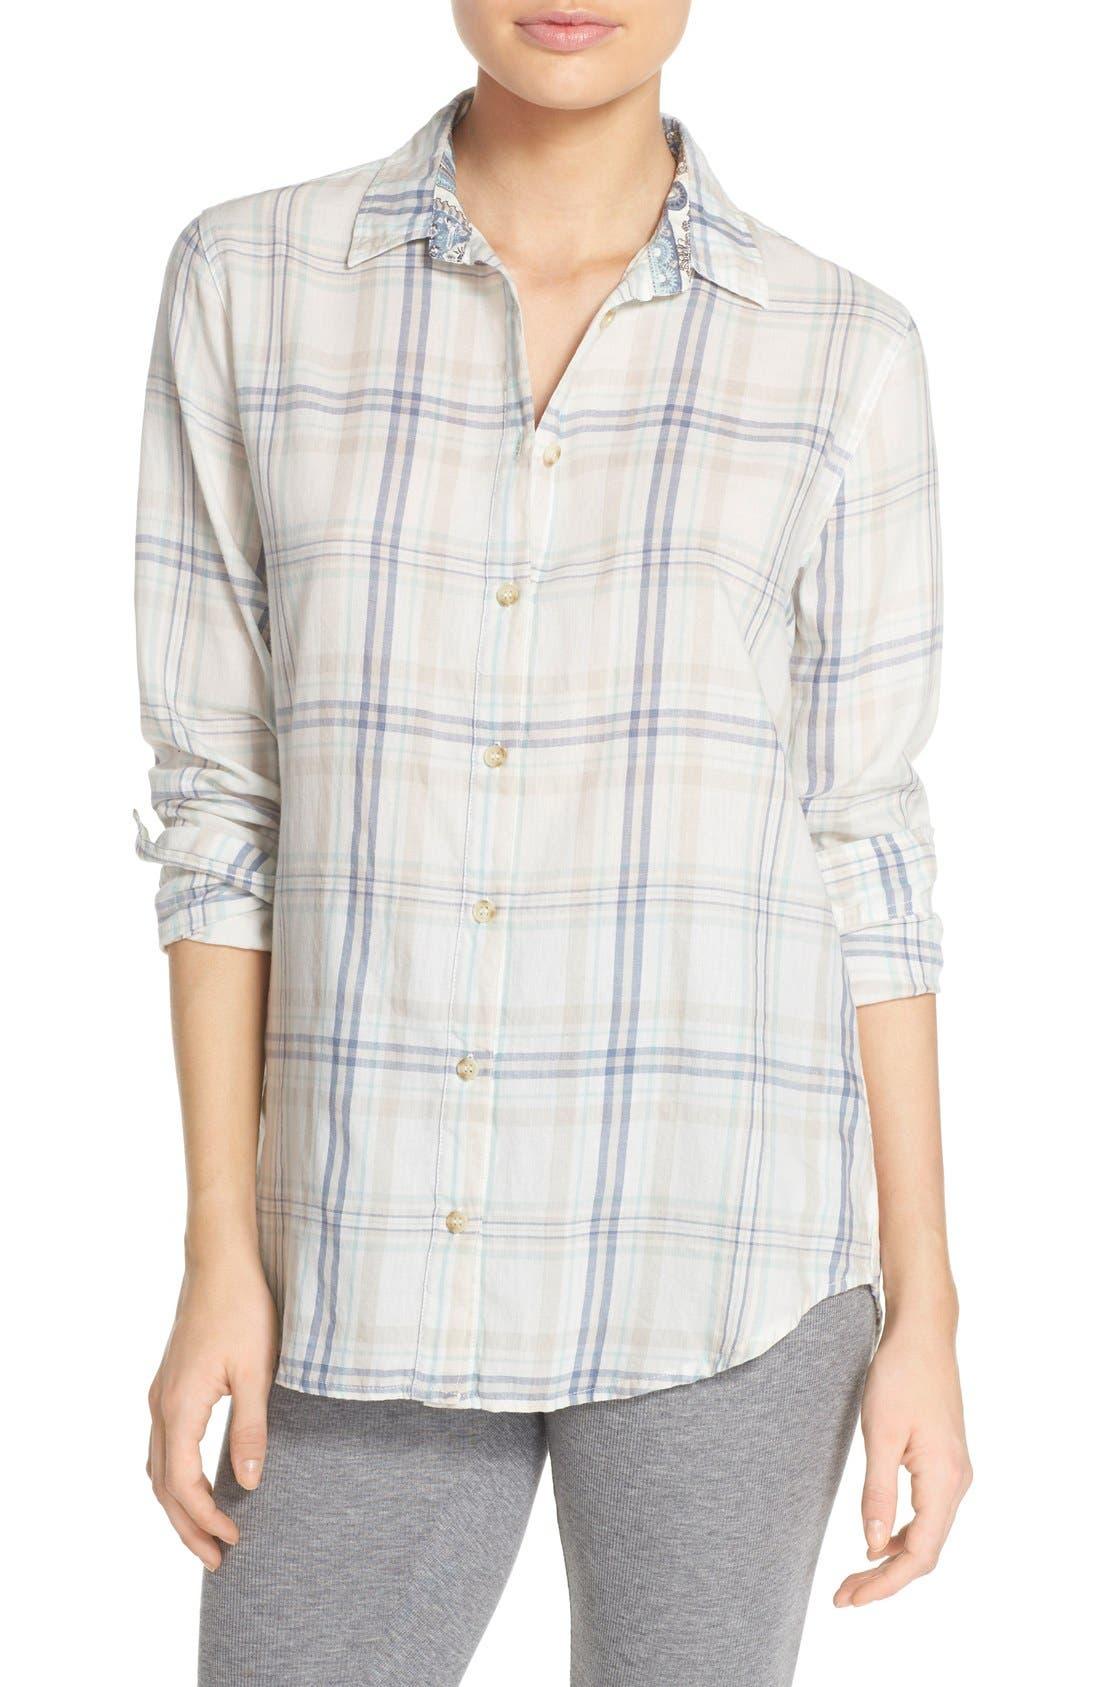 Alternate Image 1 Selected - PJ Salvage Plaid Cotton Twill Shirt